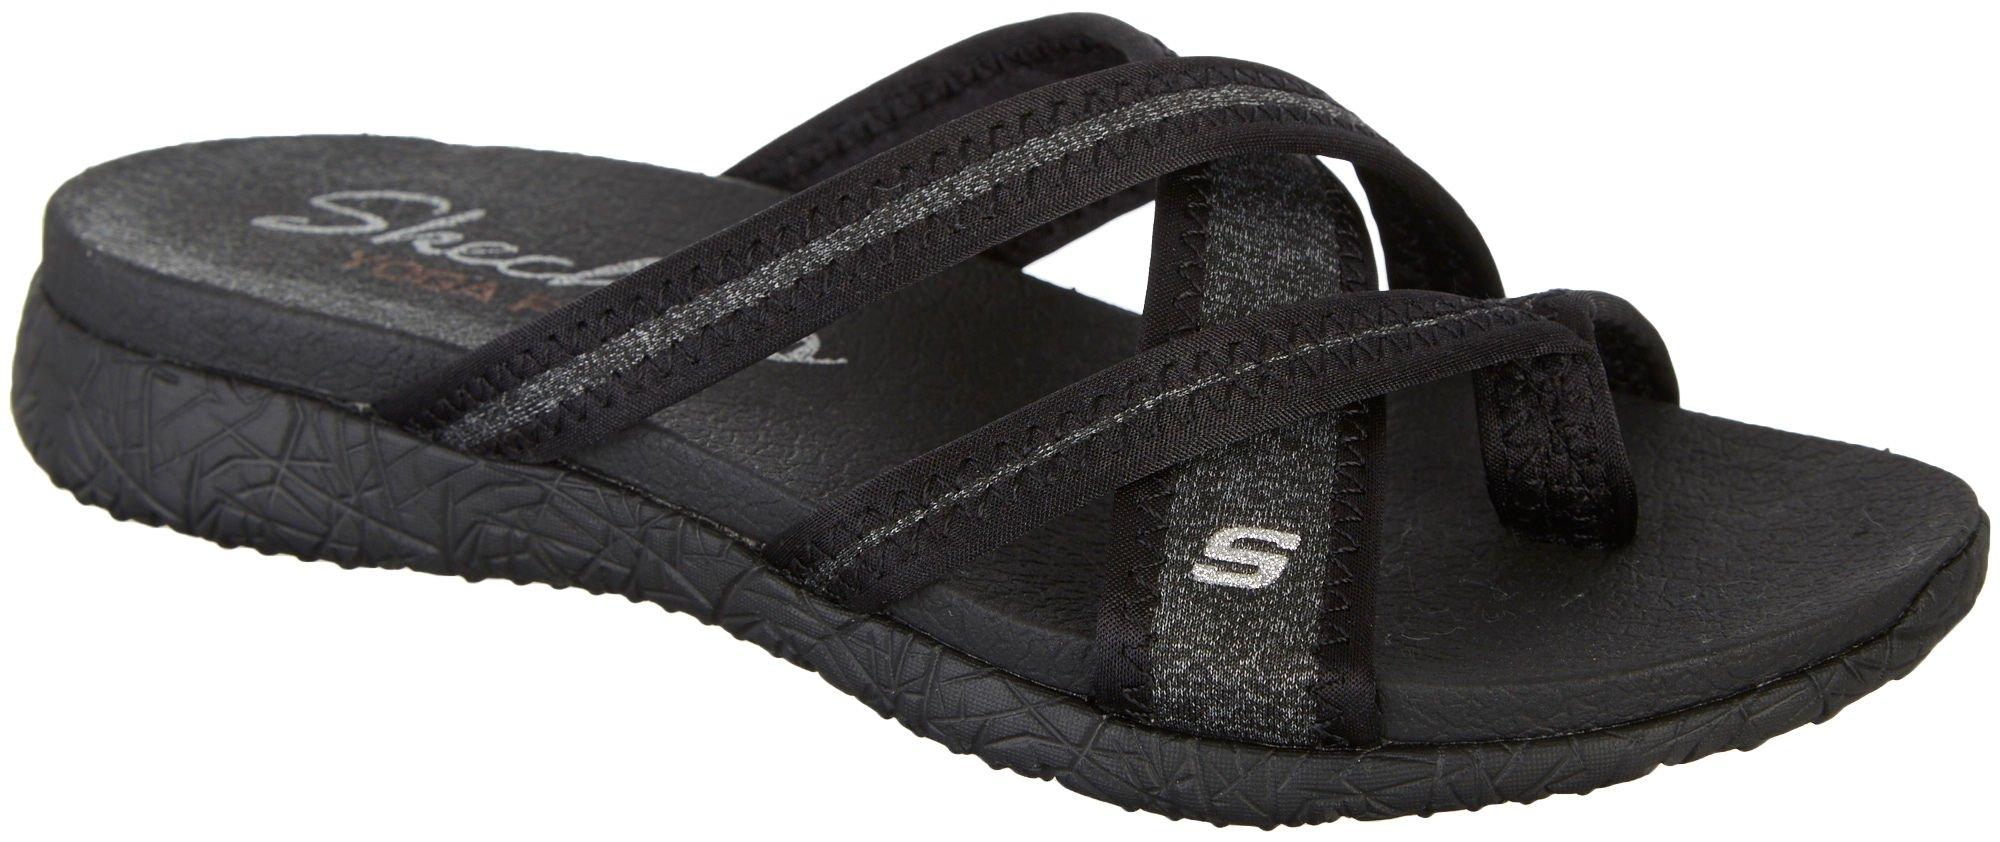 Skechers Women's Microburst - Too Hot Black Athletic Shoe